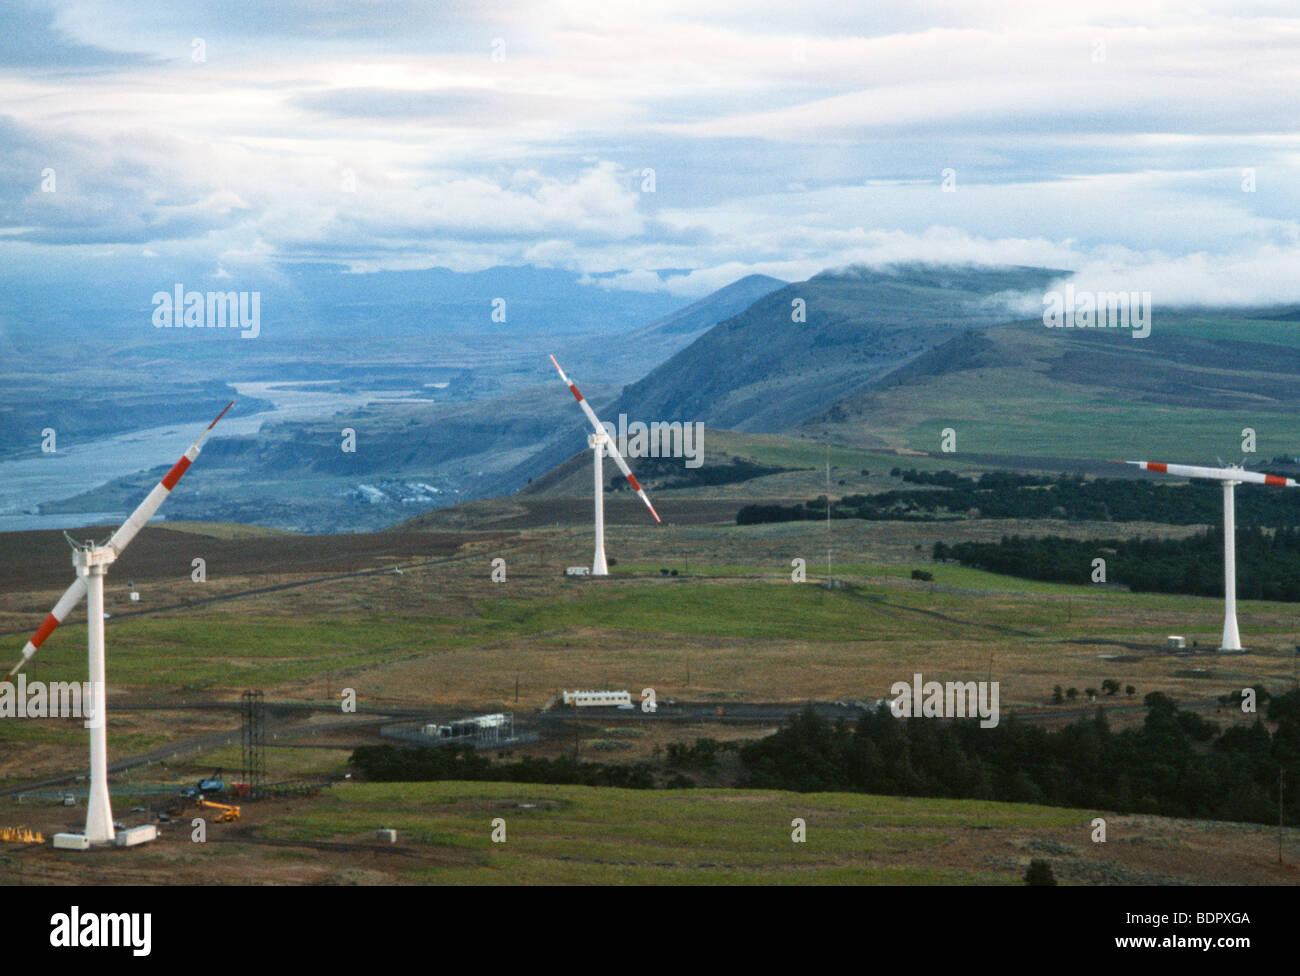 Washington State windmills, aerial view of world's largest wind turbines - Stock Image